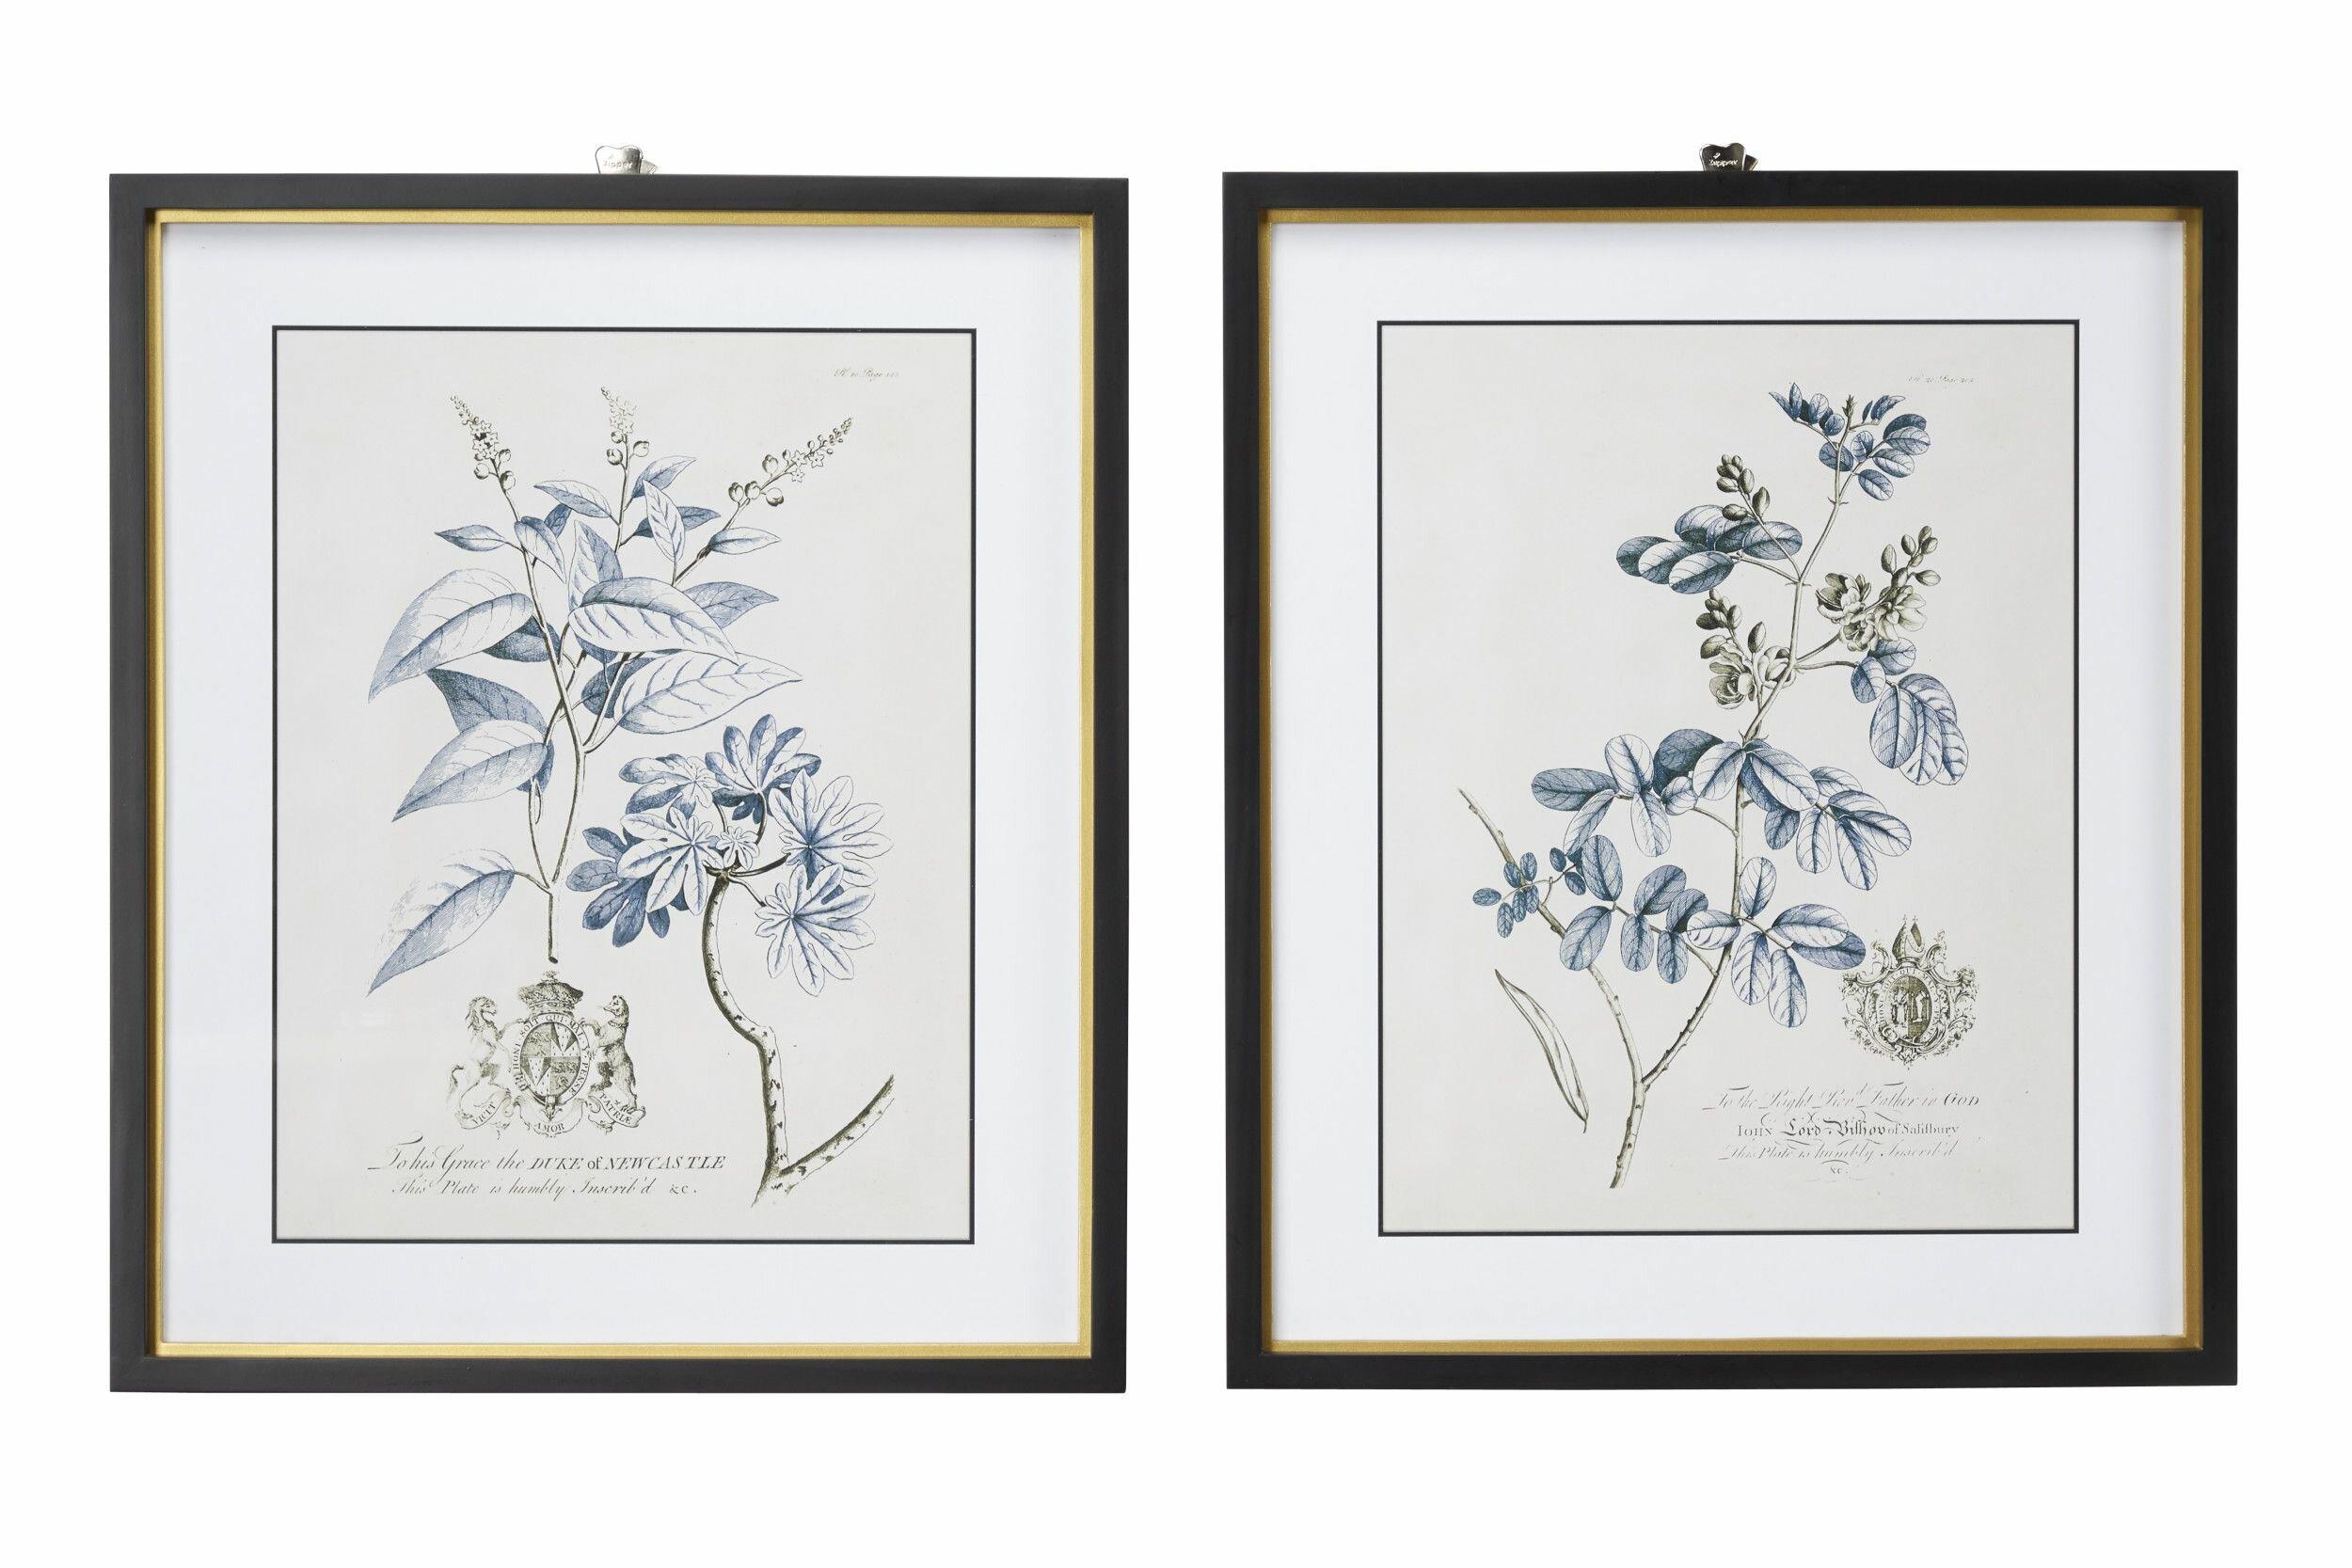 Home Decor Items Floral Flowers Botanical Single Canvas Wall Art Picture Print Va Home Furniture Diy Cruzeirista Com Br